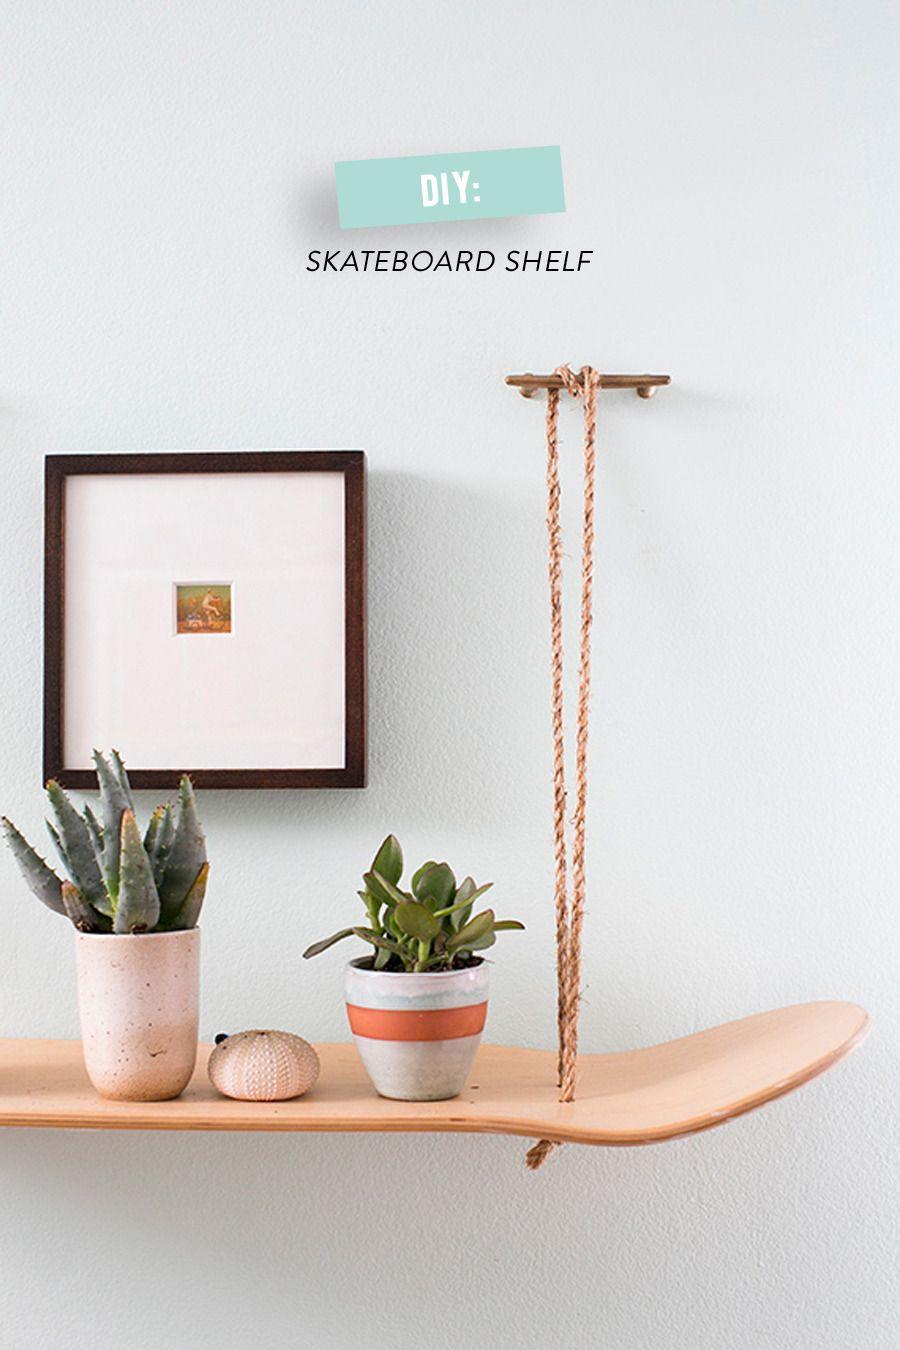 DIY Skateboard shelf. #diy, #home-decor, #shelf, #skateboard  Photography: Scott Clark Photo - scottclarkphoto.com/  Read More: http://www.stylemepretty.com/living/2014/08/06/diy-skateboard-shelf/